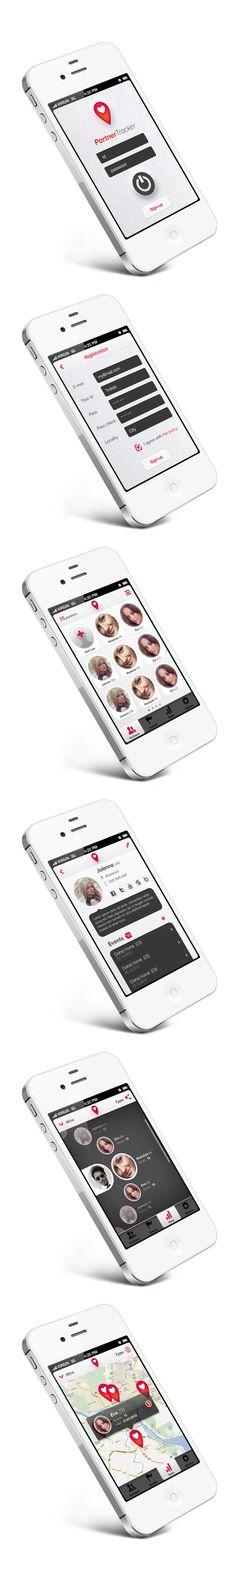 Partner Tracker App by Martin Schurdak, via Behance *** Smartphone application for sex-partner tracking :)